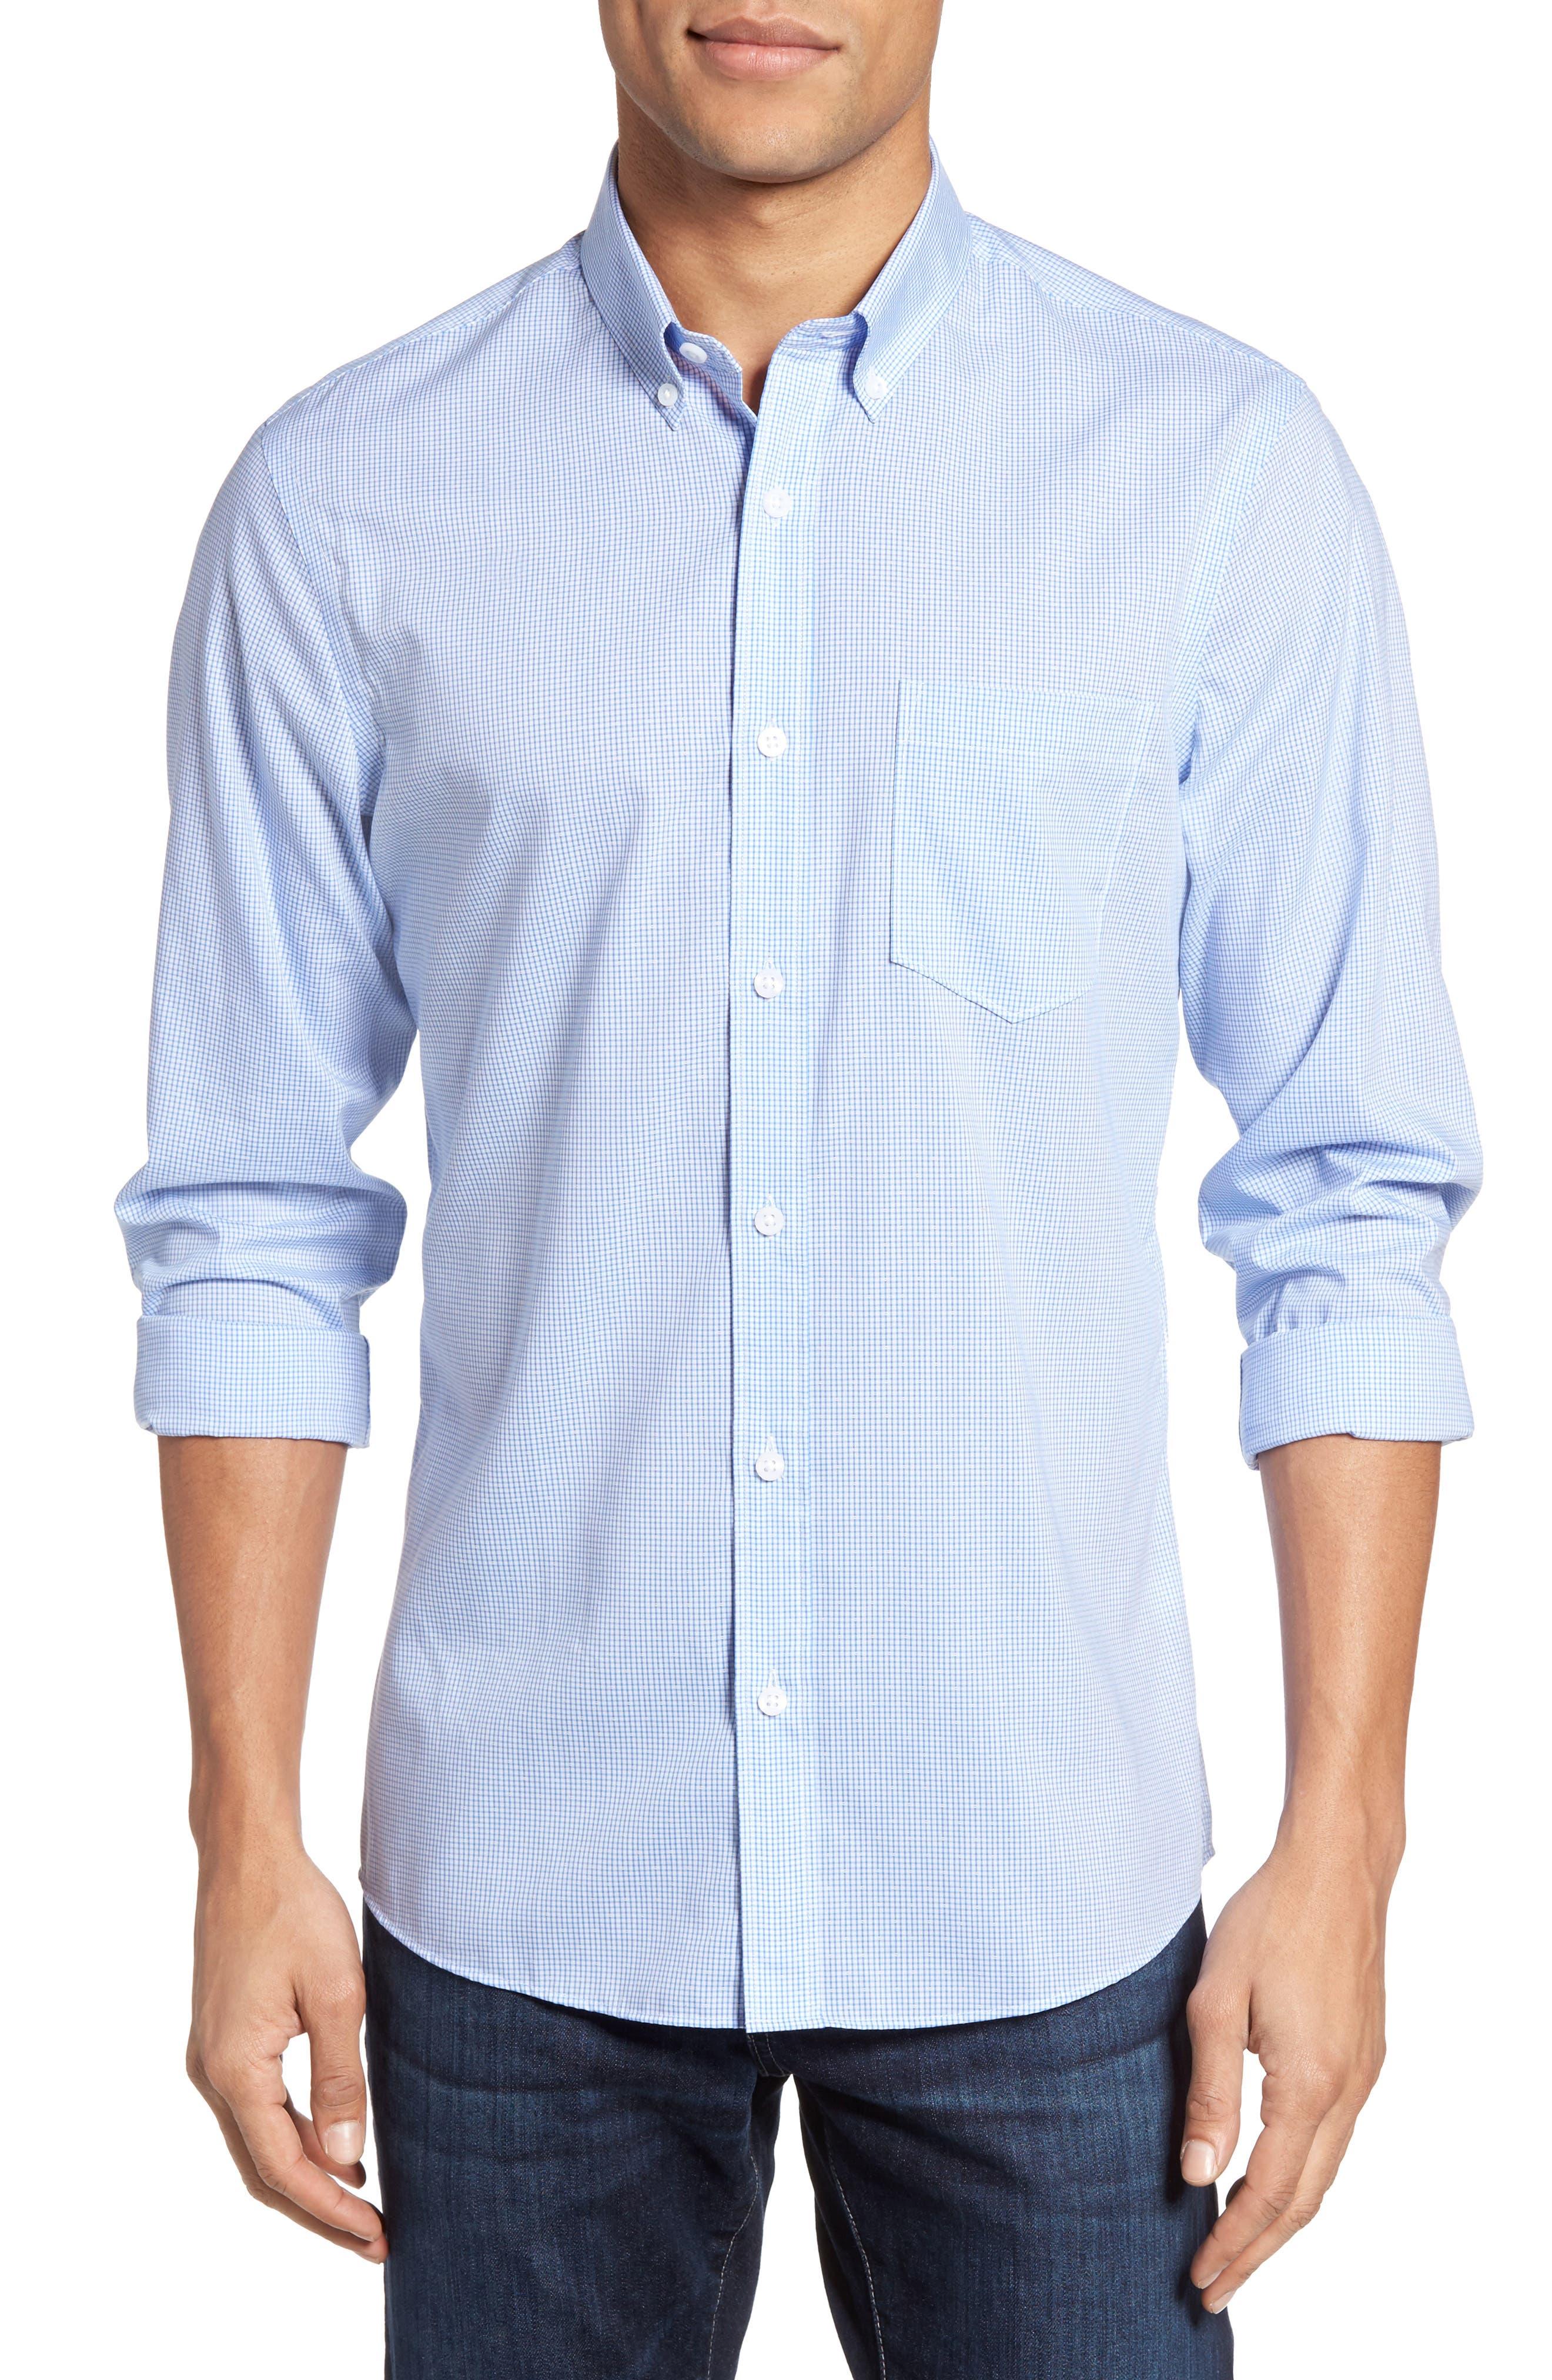 Main Image - Nordstrom Men's Shop Trim Fit Non-Iron Dobby Check Sport Shirt (Regular & Tall)